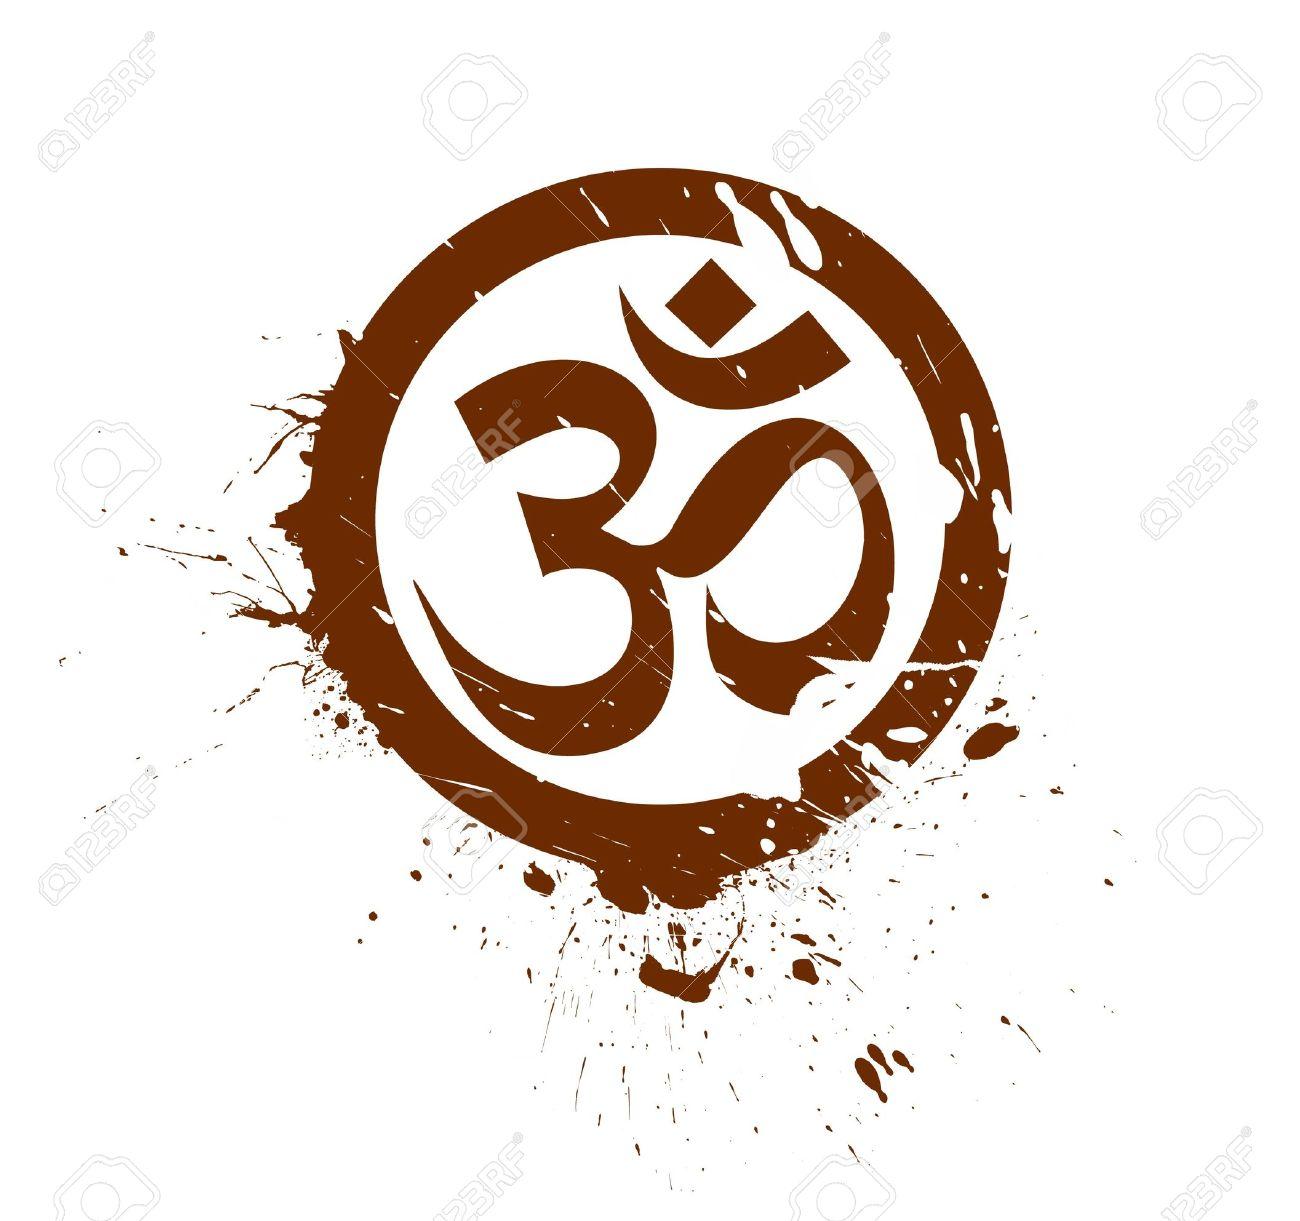 grunge lord ganesha, diwali symbols design Stock Vector - 11193870